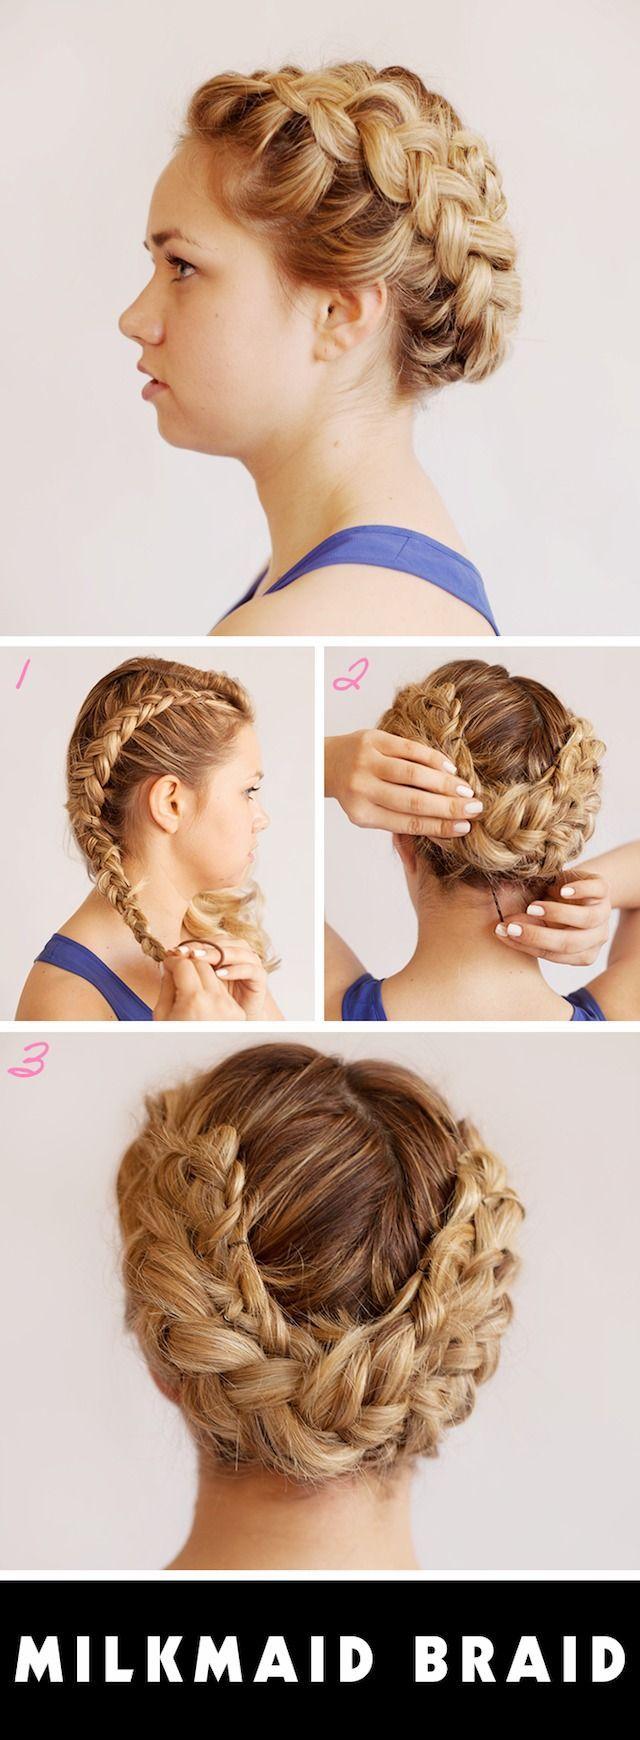 #hairstyle #milkmaid #tutorial #braids #updos #braid #prom ...